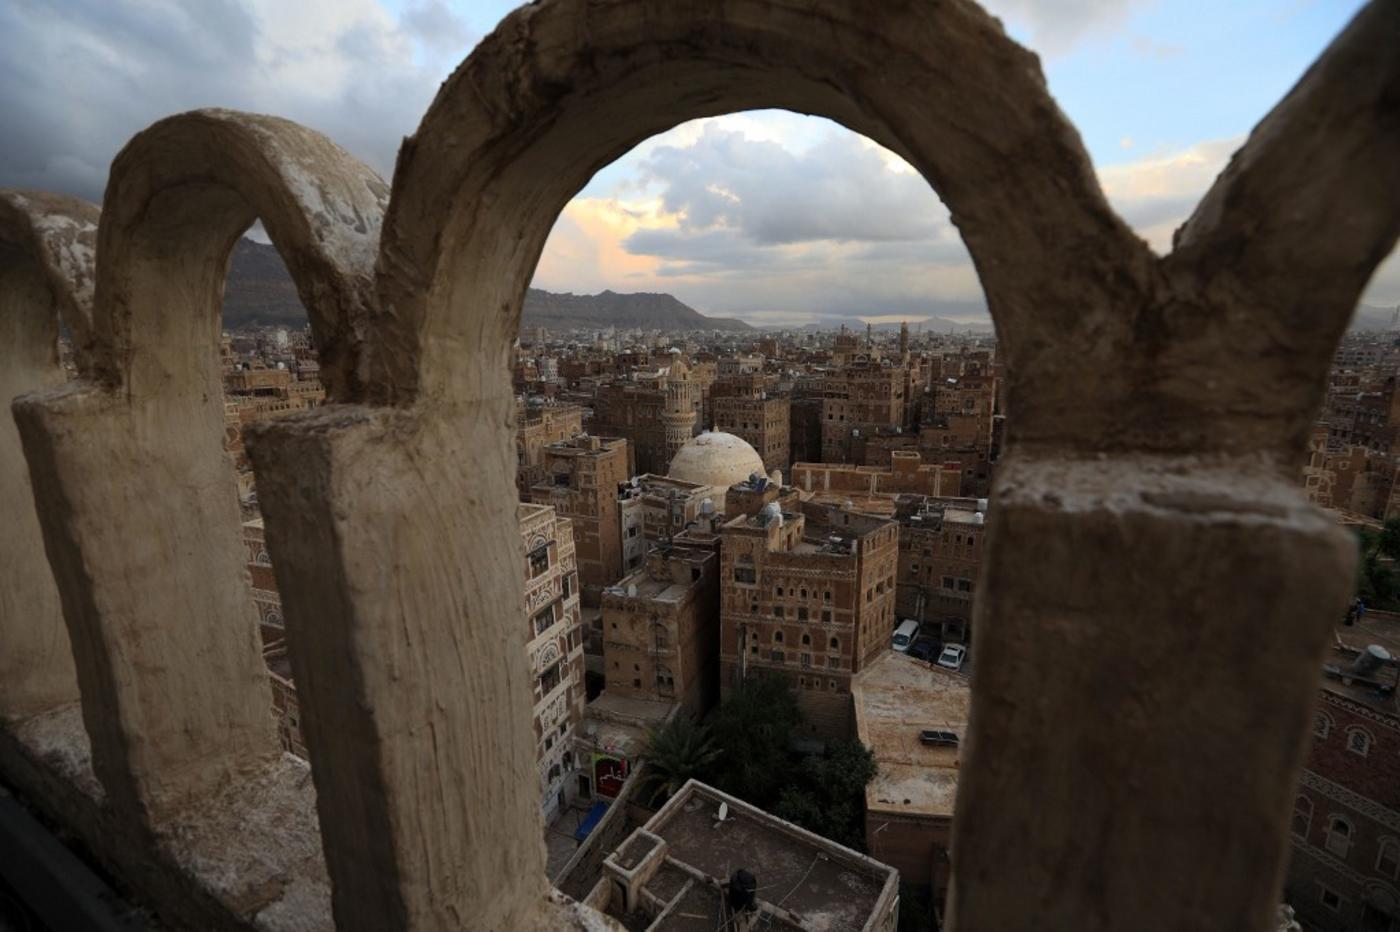 Saudi-led coalition urges Yemen's separatists to honour Riyadh peace deal